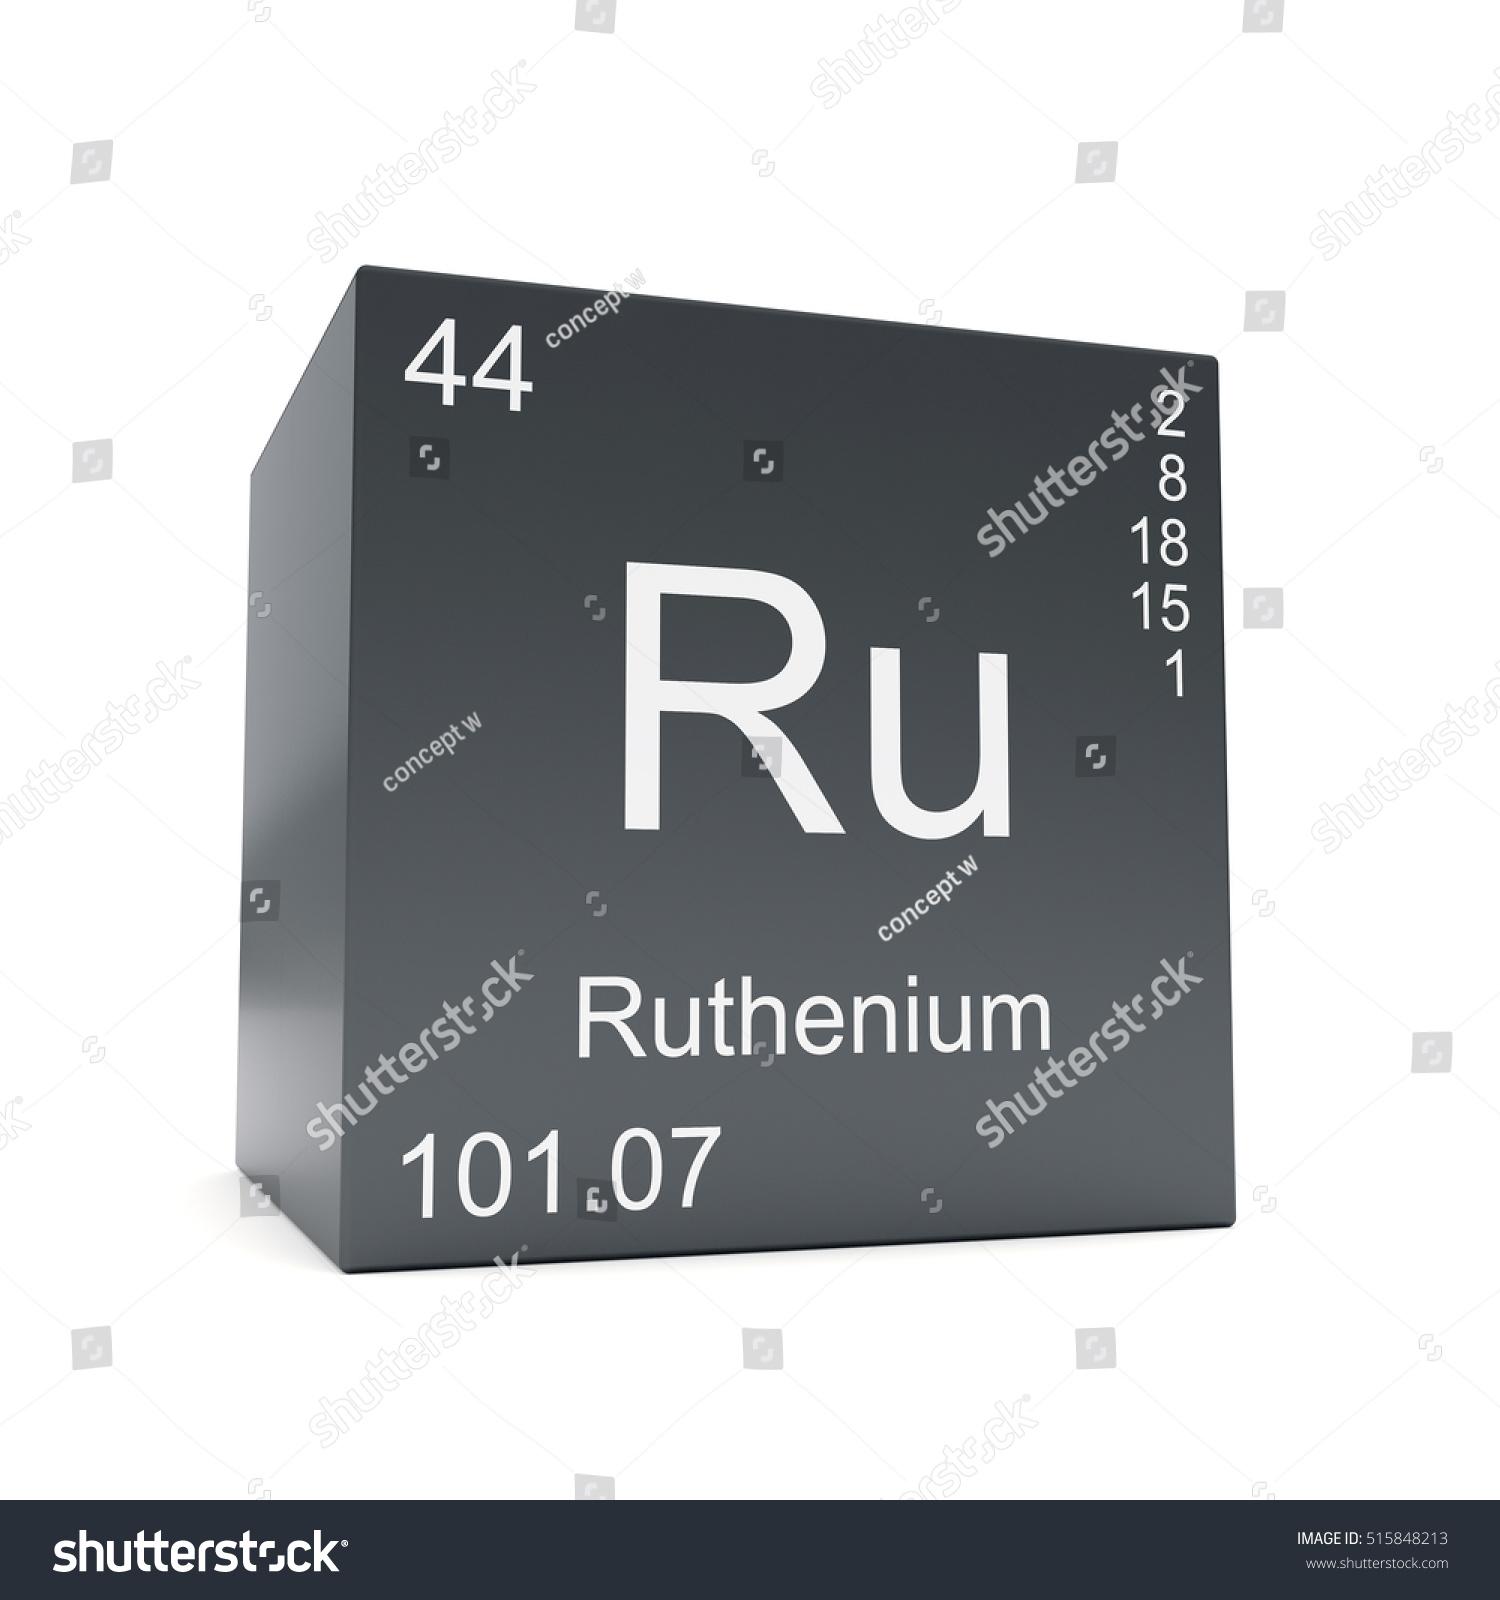 Ruthenium Chemical Element Symbol Periodic Table Stock Illustration